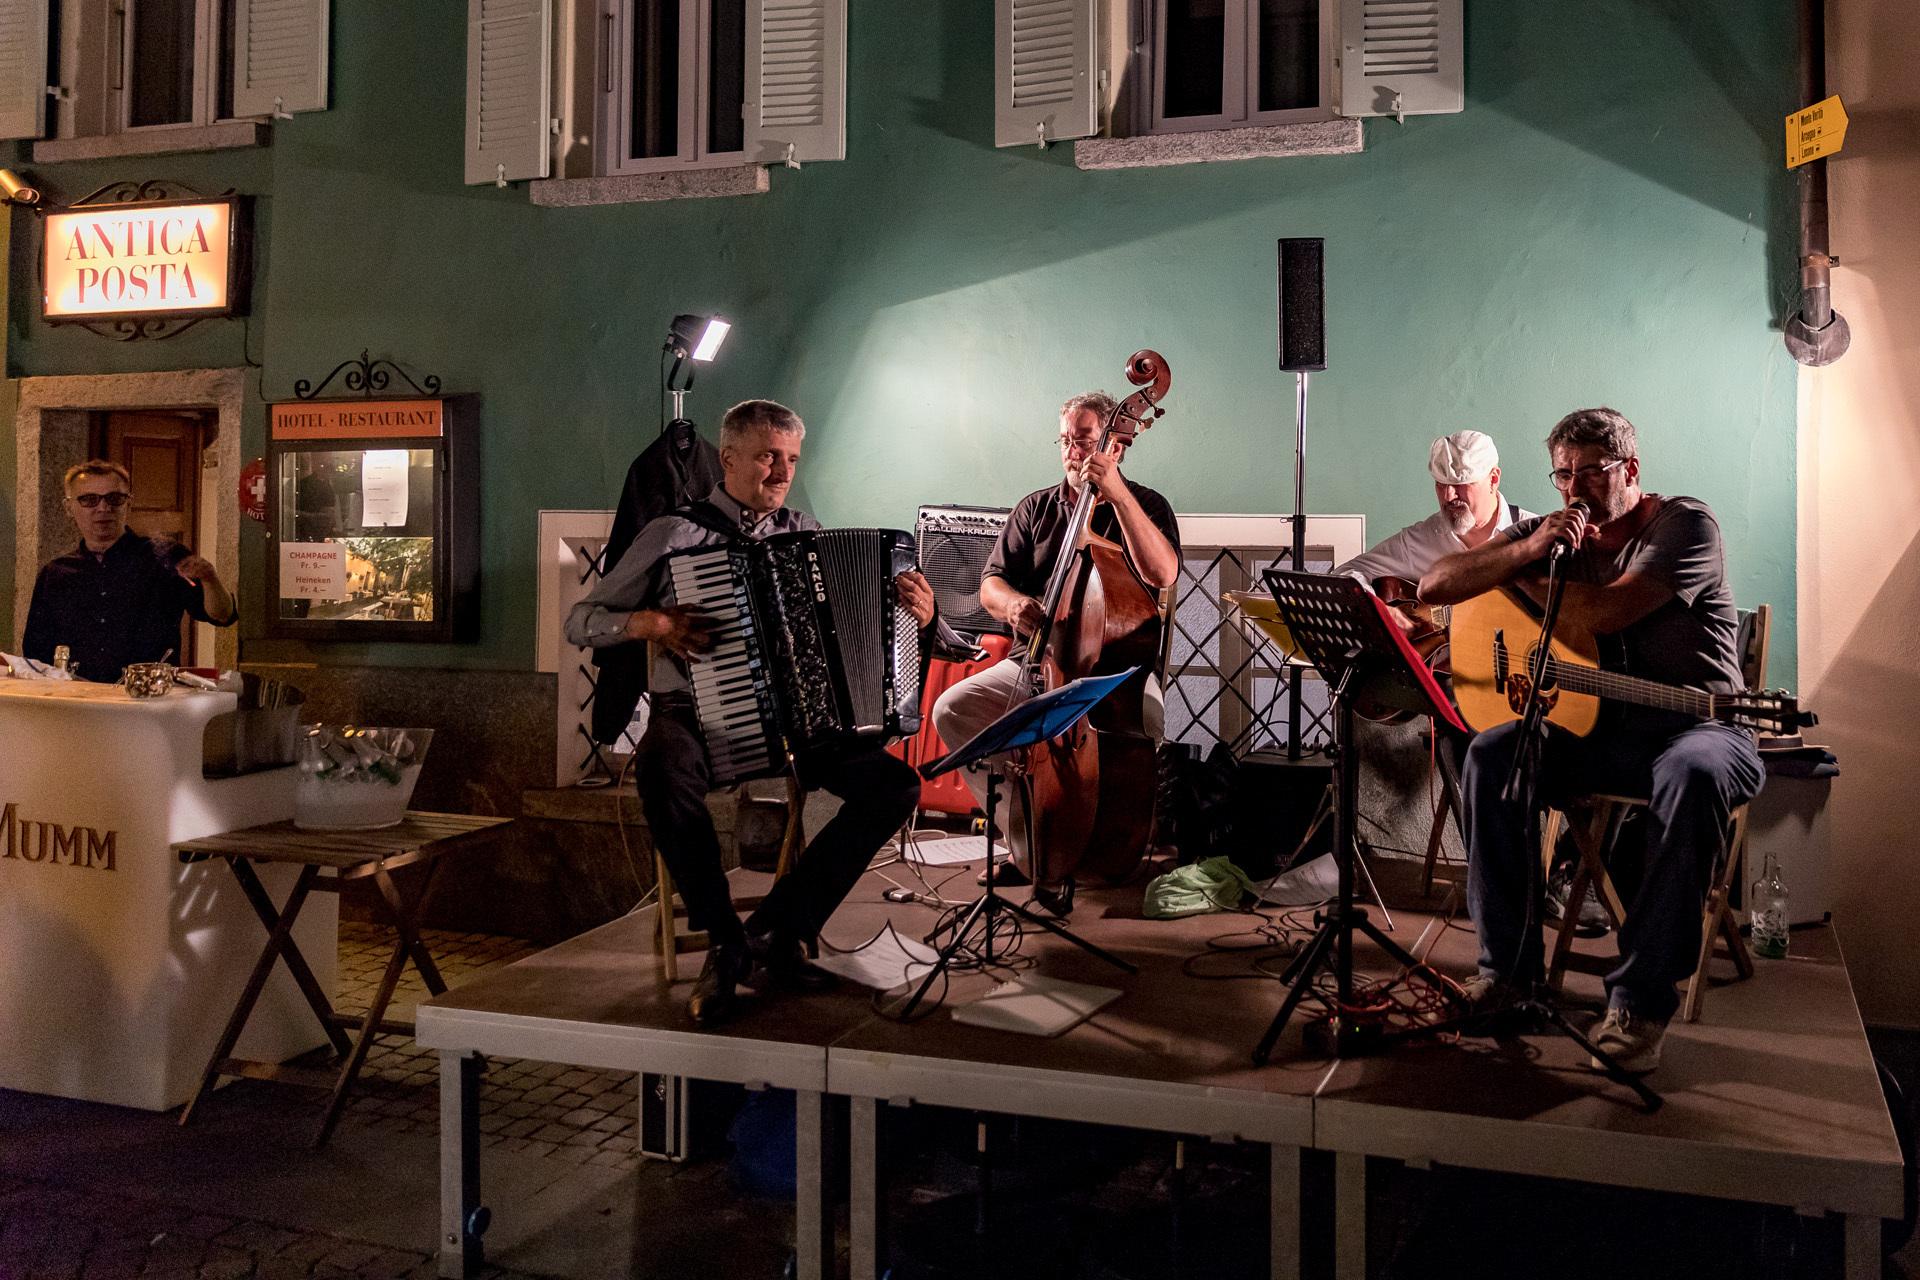 2018_08_18-Ascona-Jazz-Night-©-Luca-Vantusso-5D4A2447